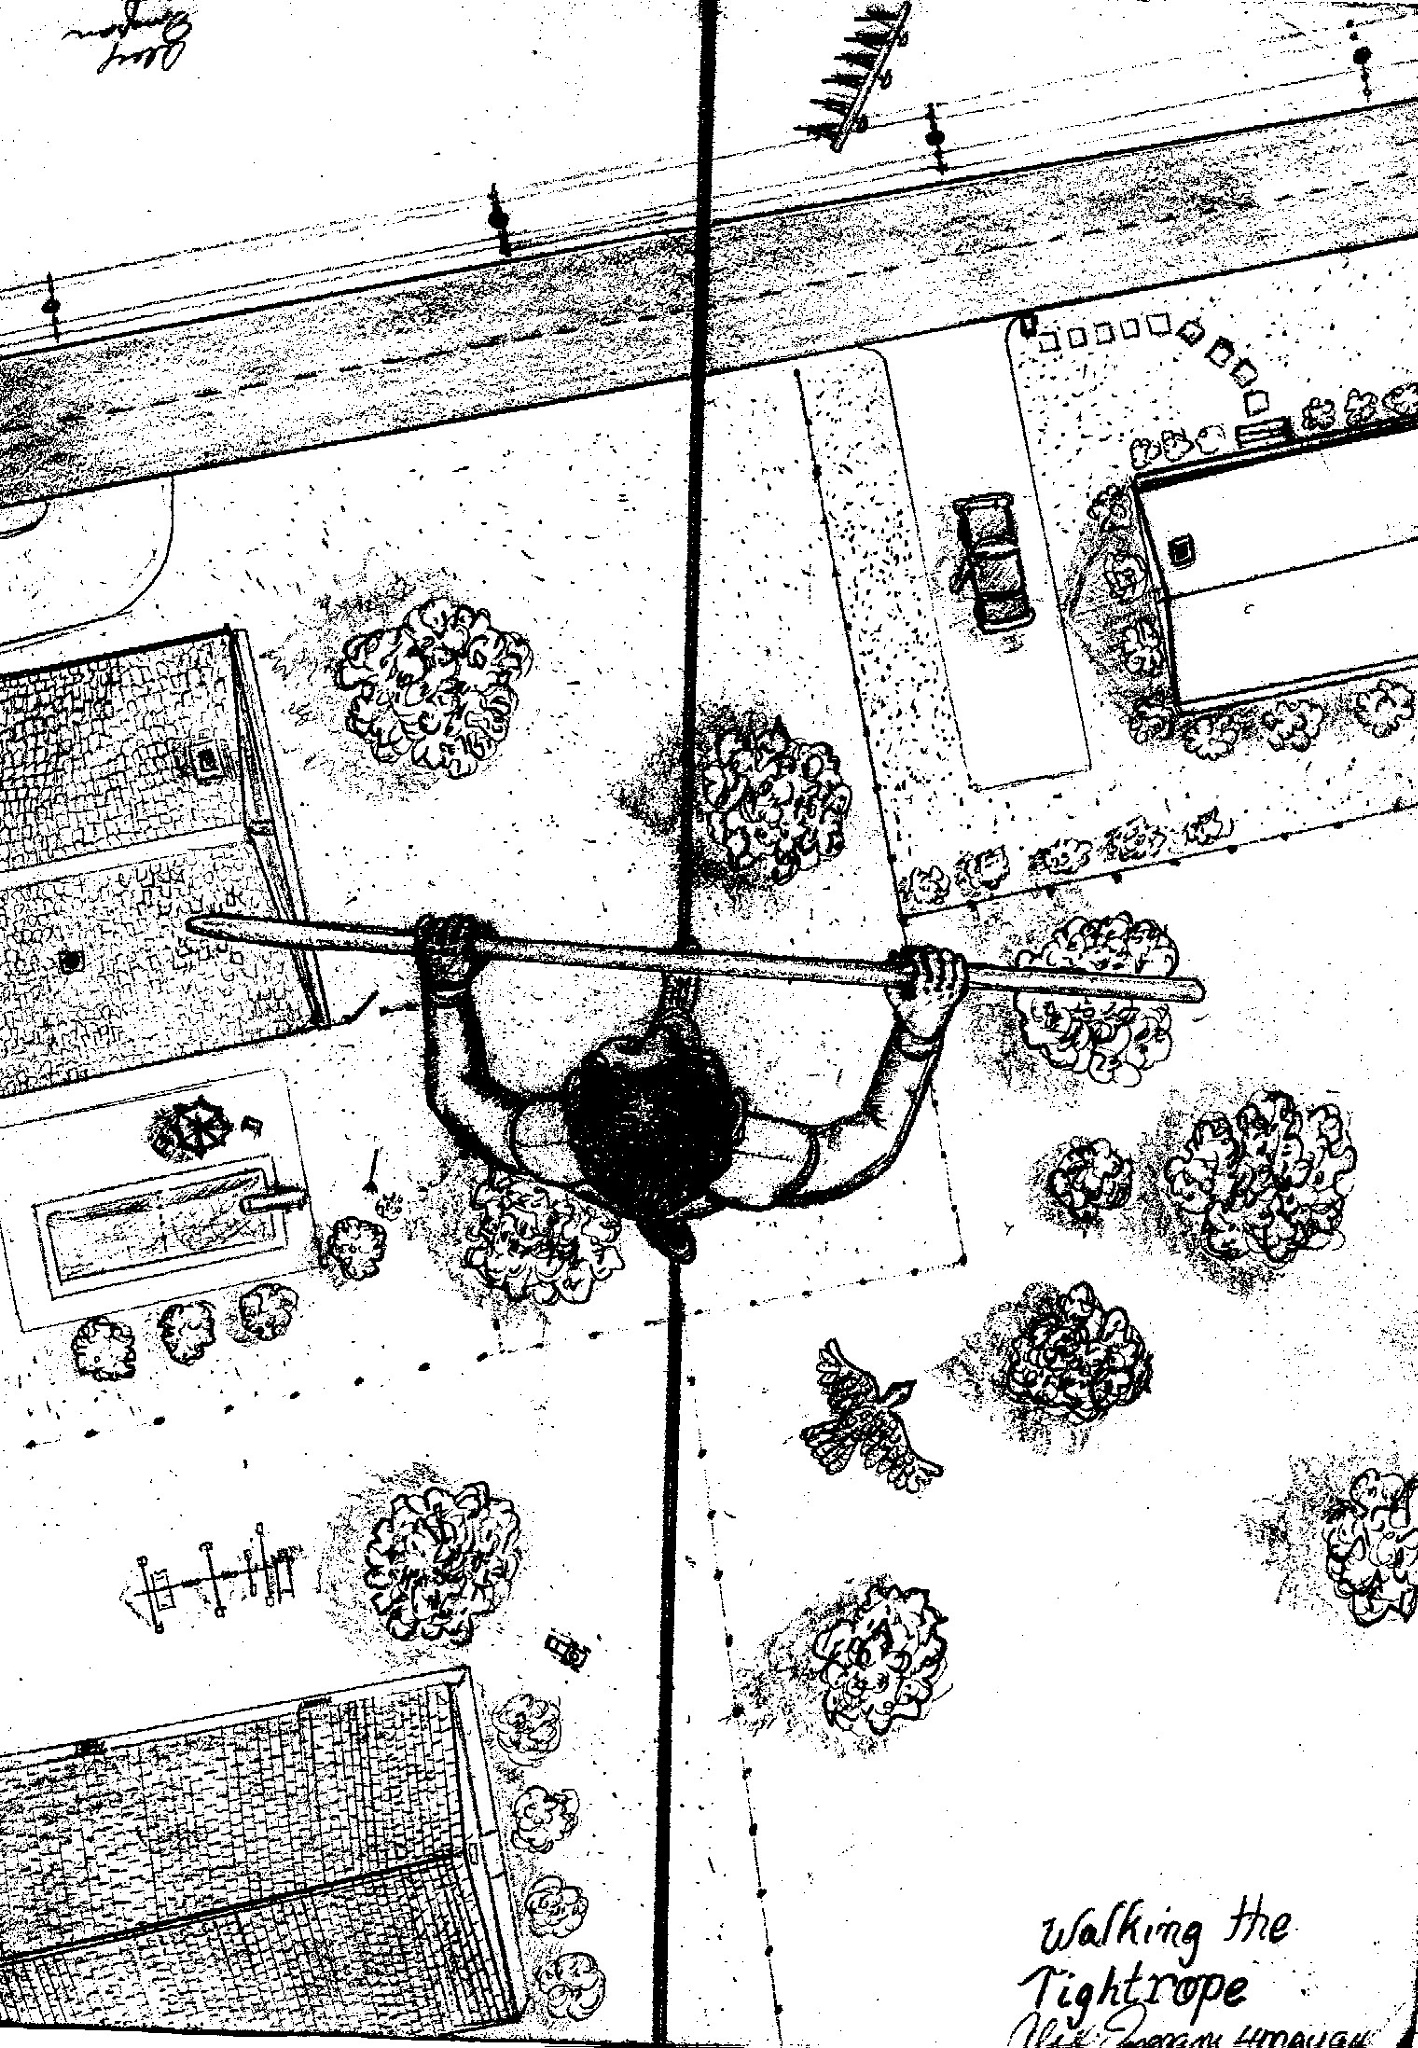 Walking the line (residential version) by Alex Ingram